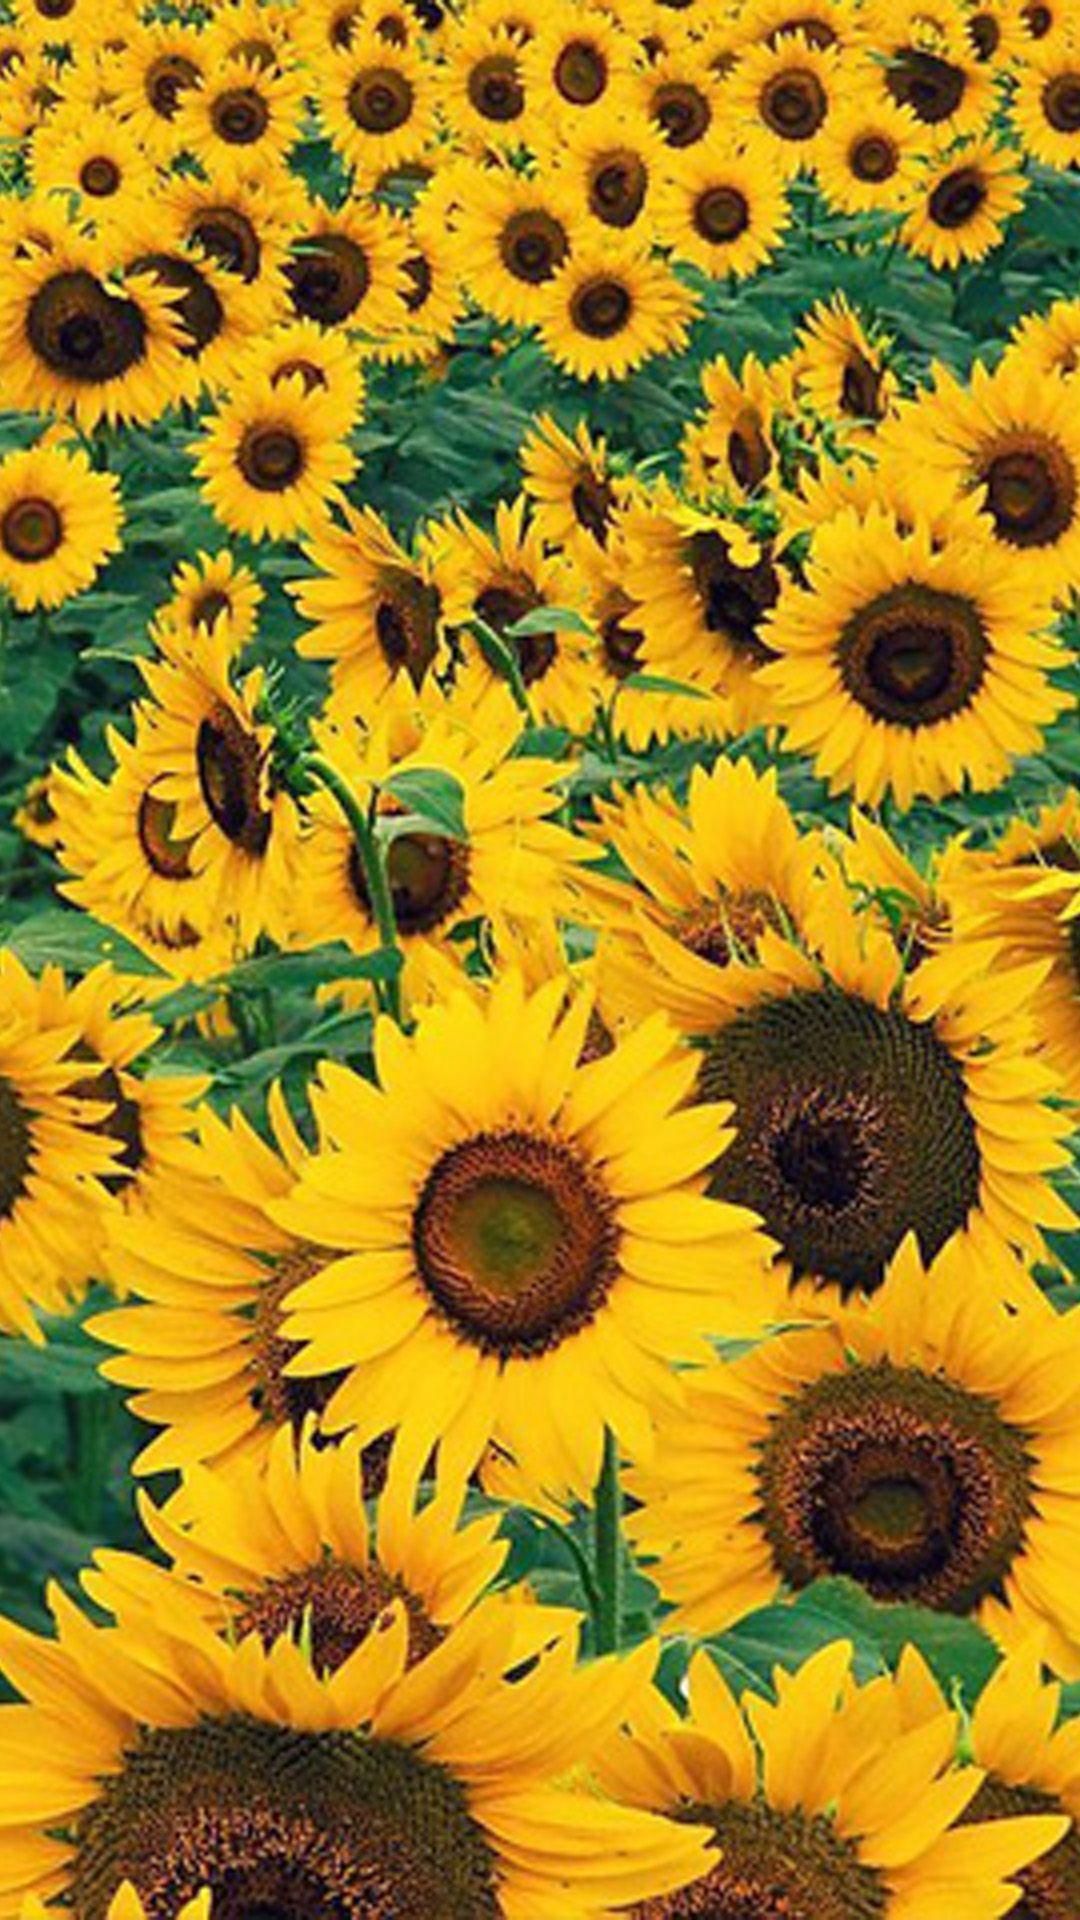 1080x1920 Sunflower Wallpapers Best Wallpapers